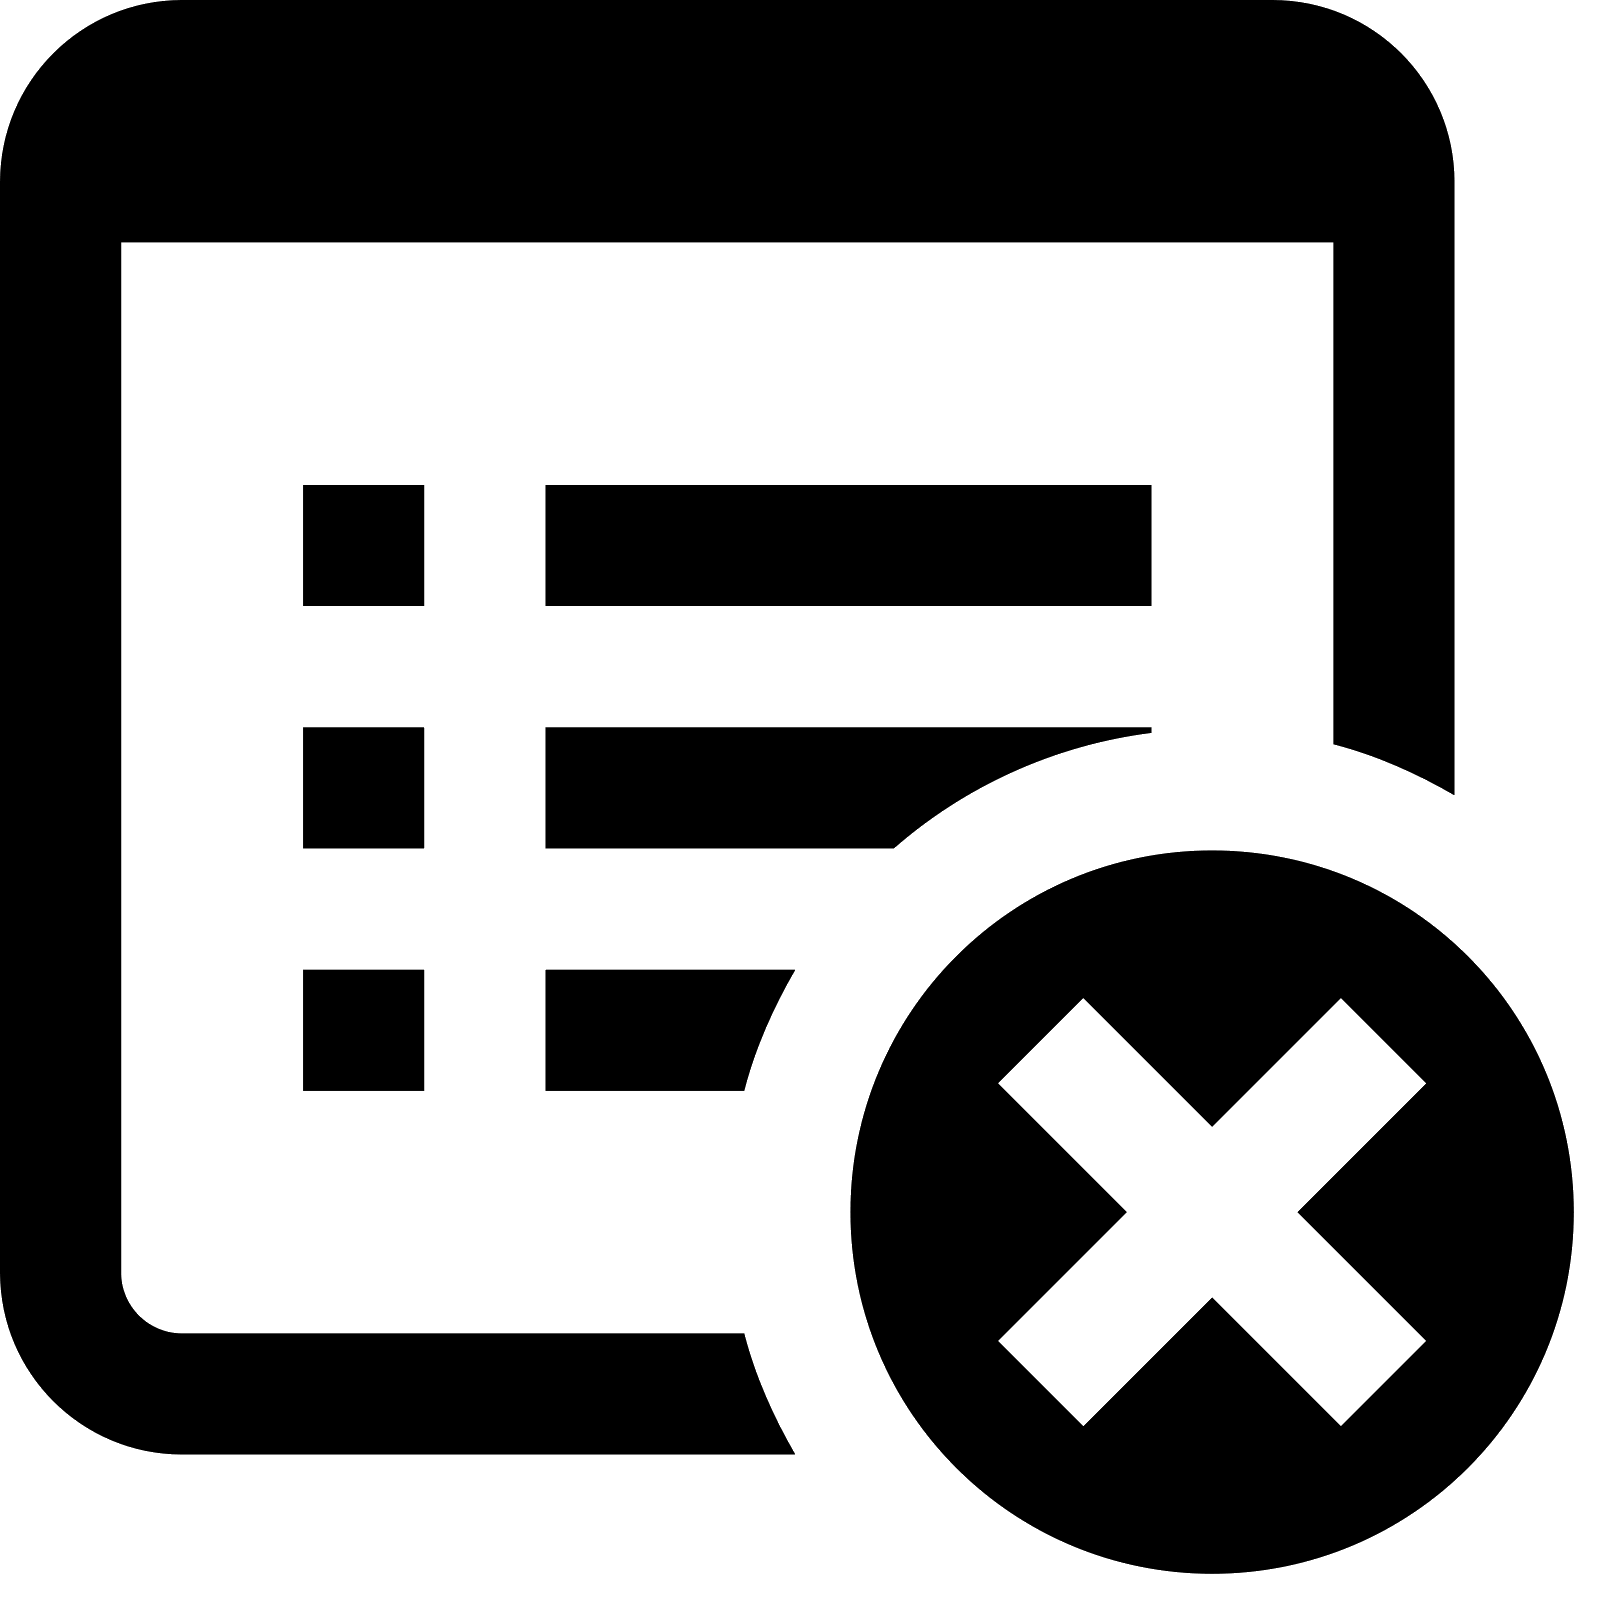 jpg stock Document icono descarga gratuita. Delete vector png.